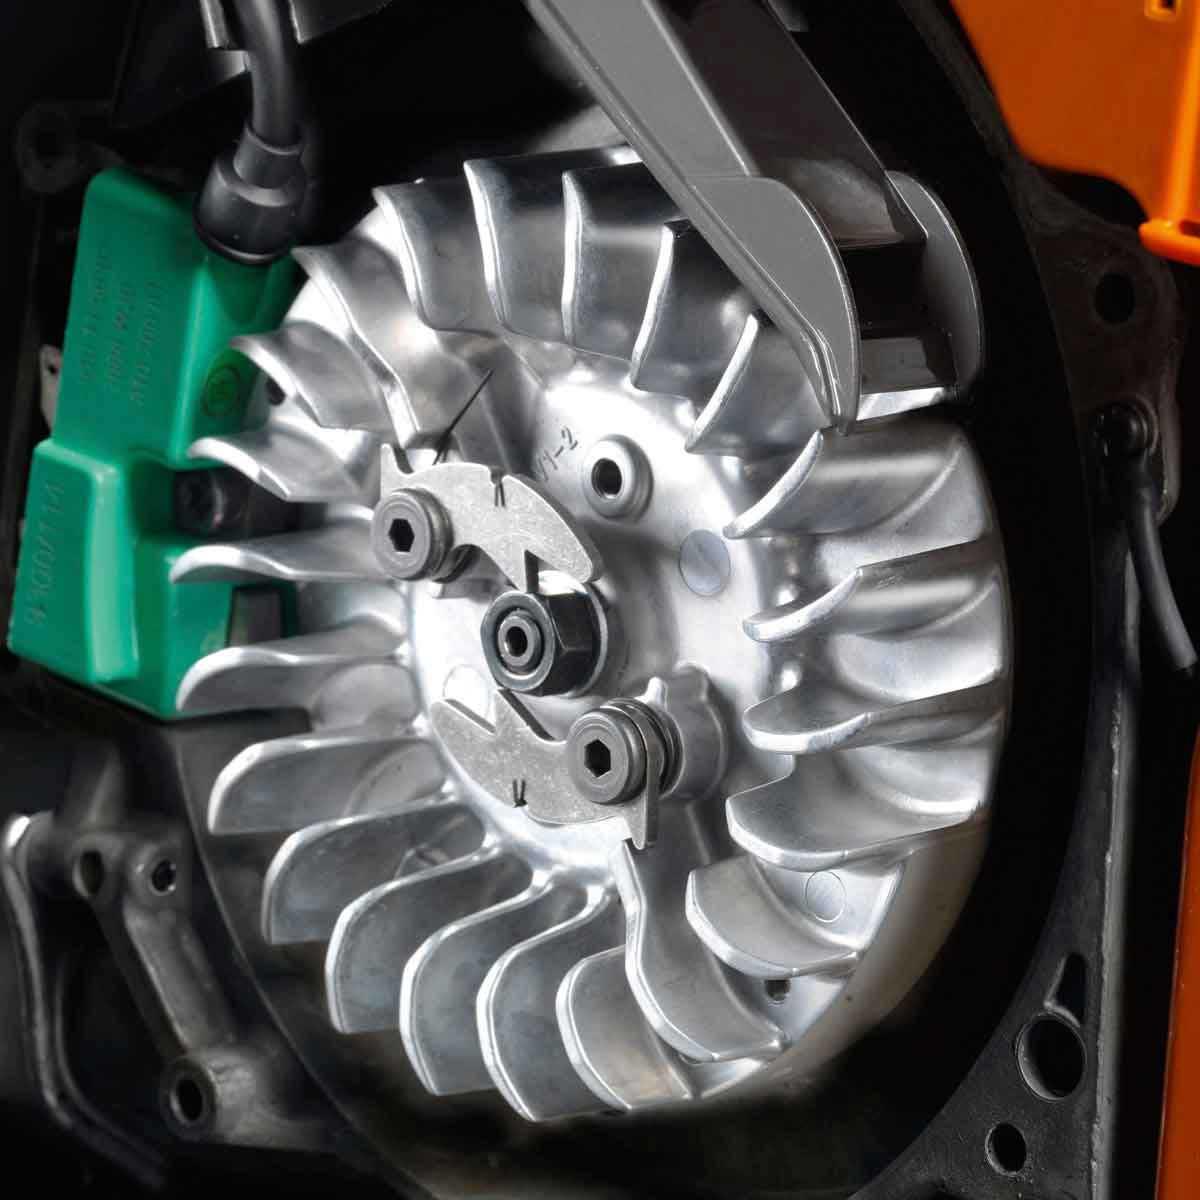 Husqvarna power cutter flywheel